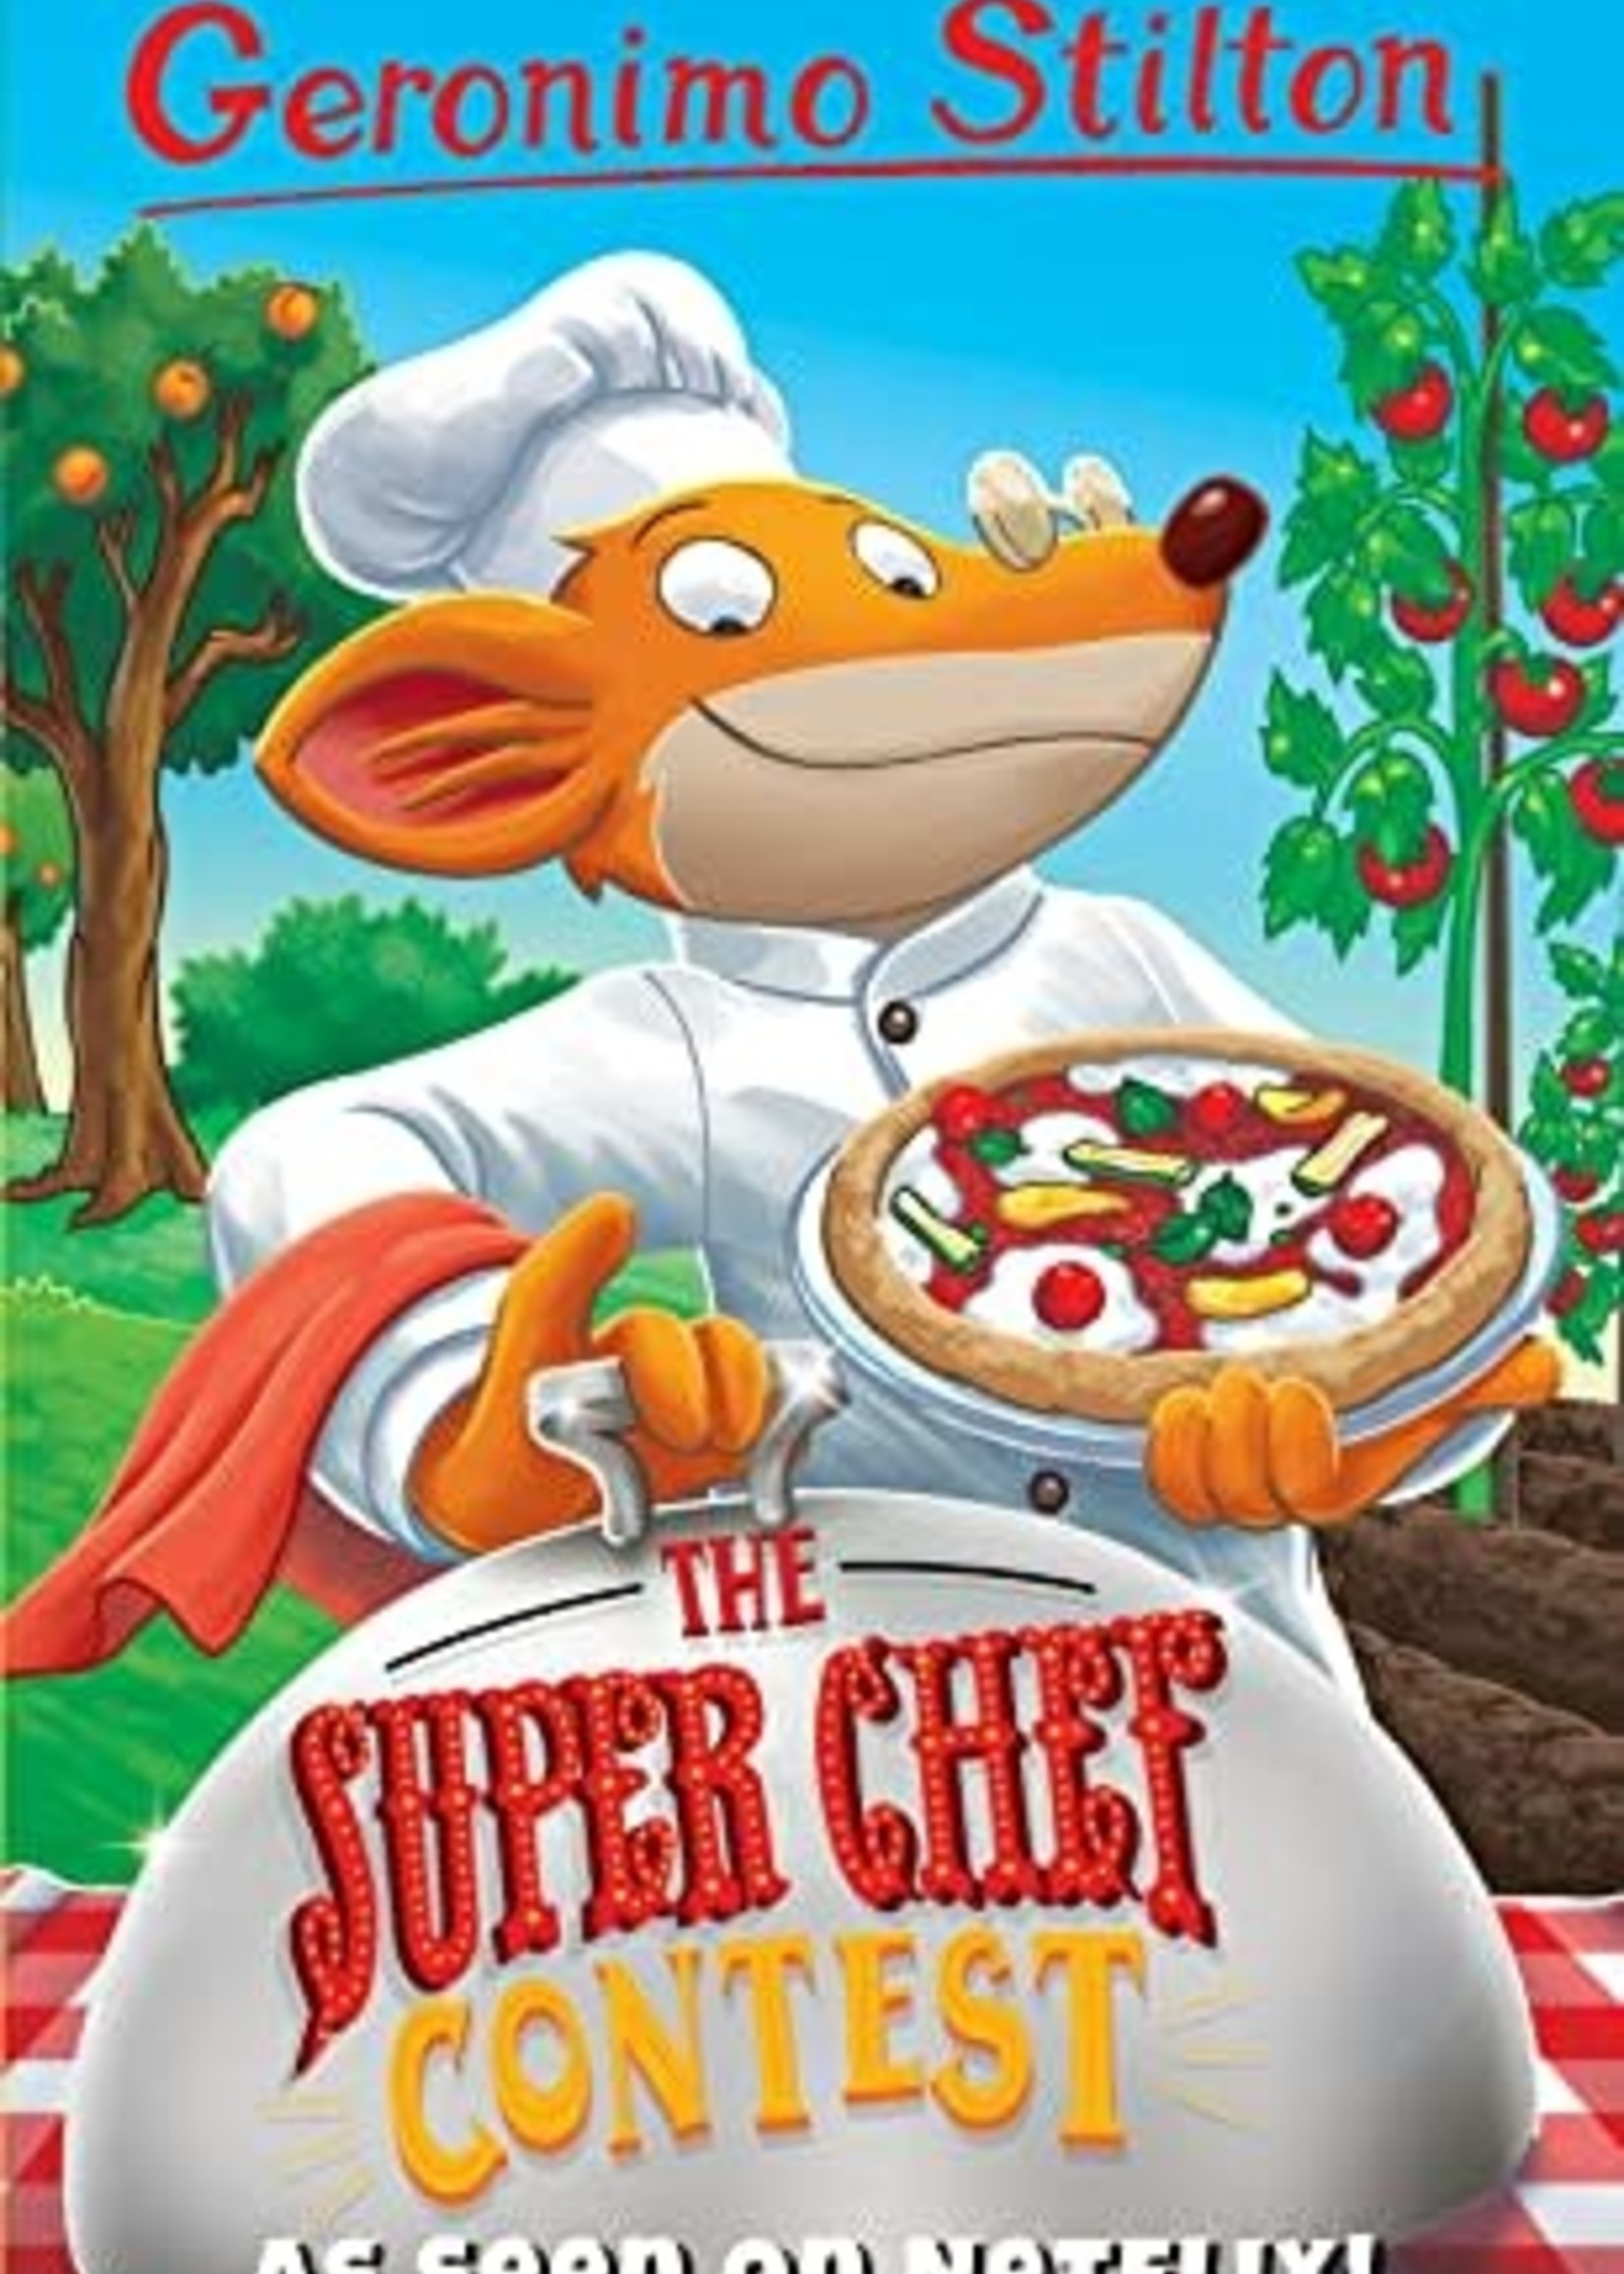 The Super Chef Contest (Geronimo Stilton #58) by Geronimo Stilton